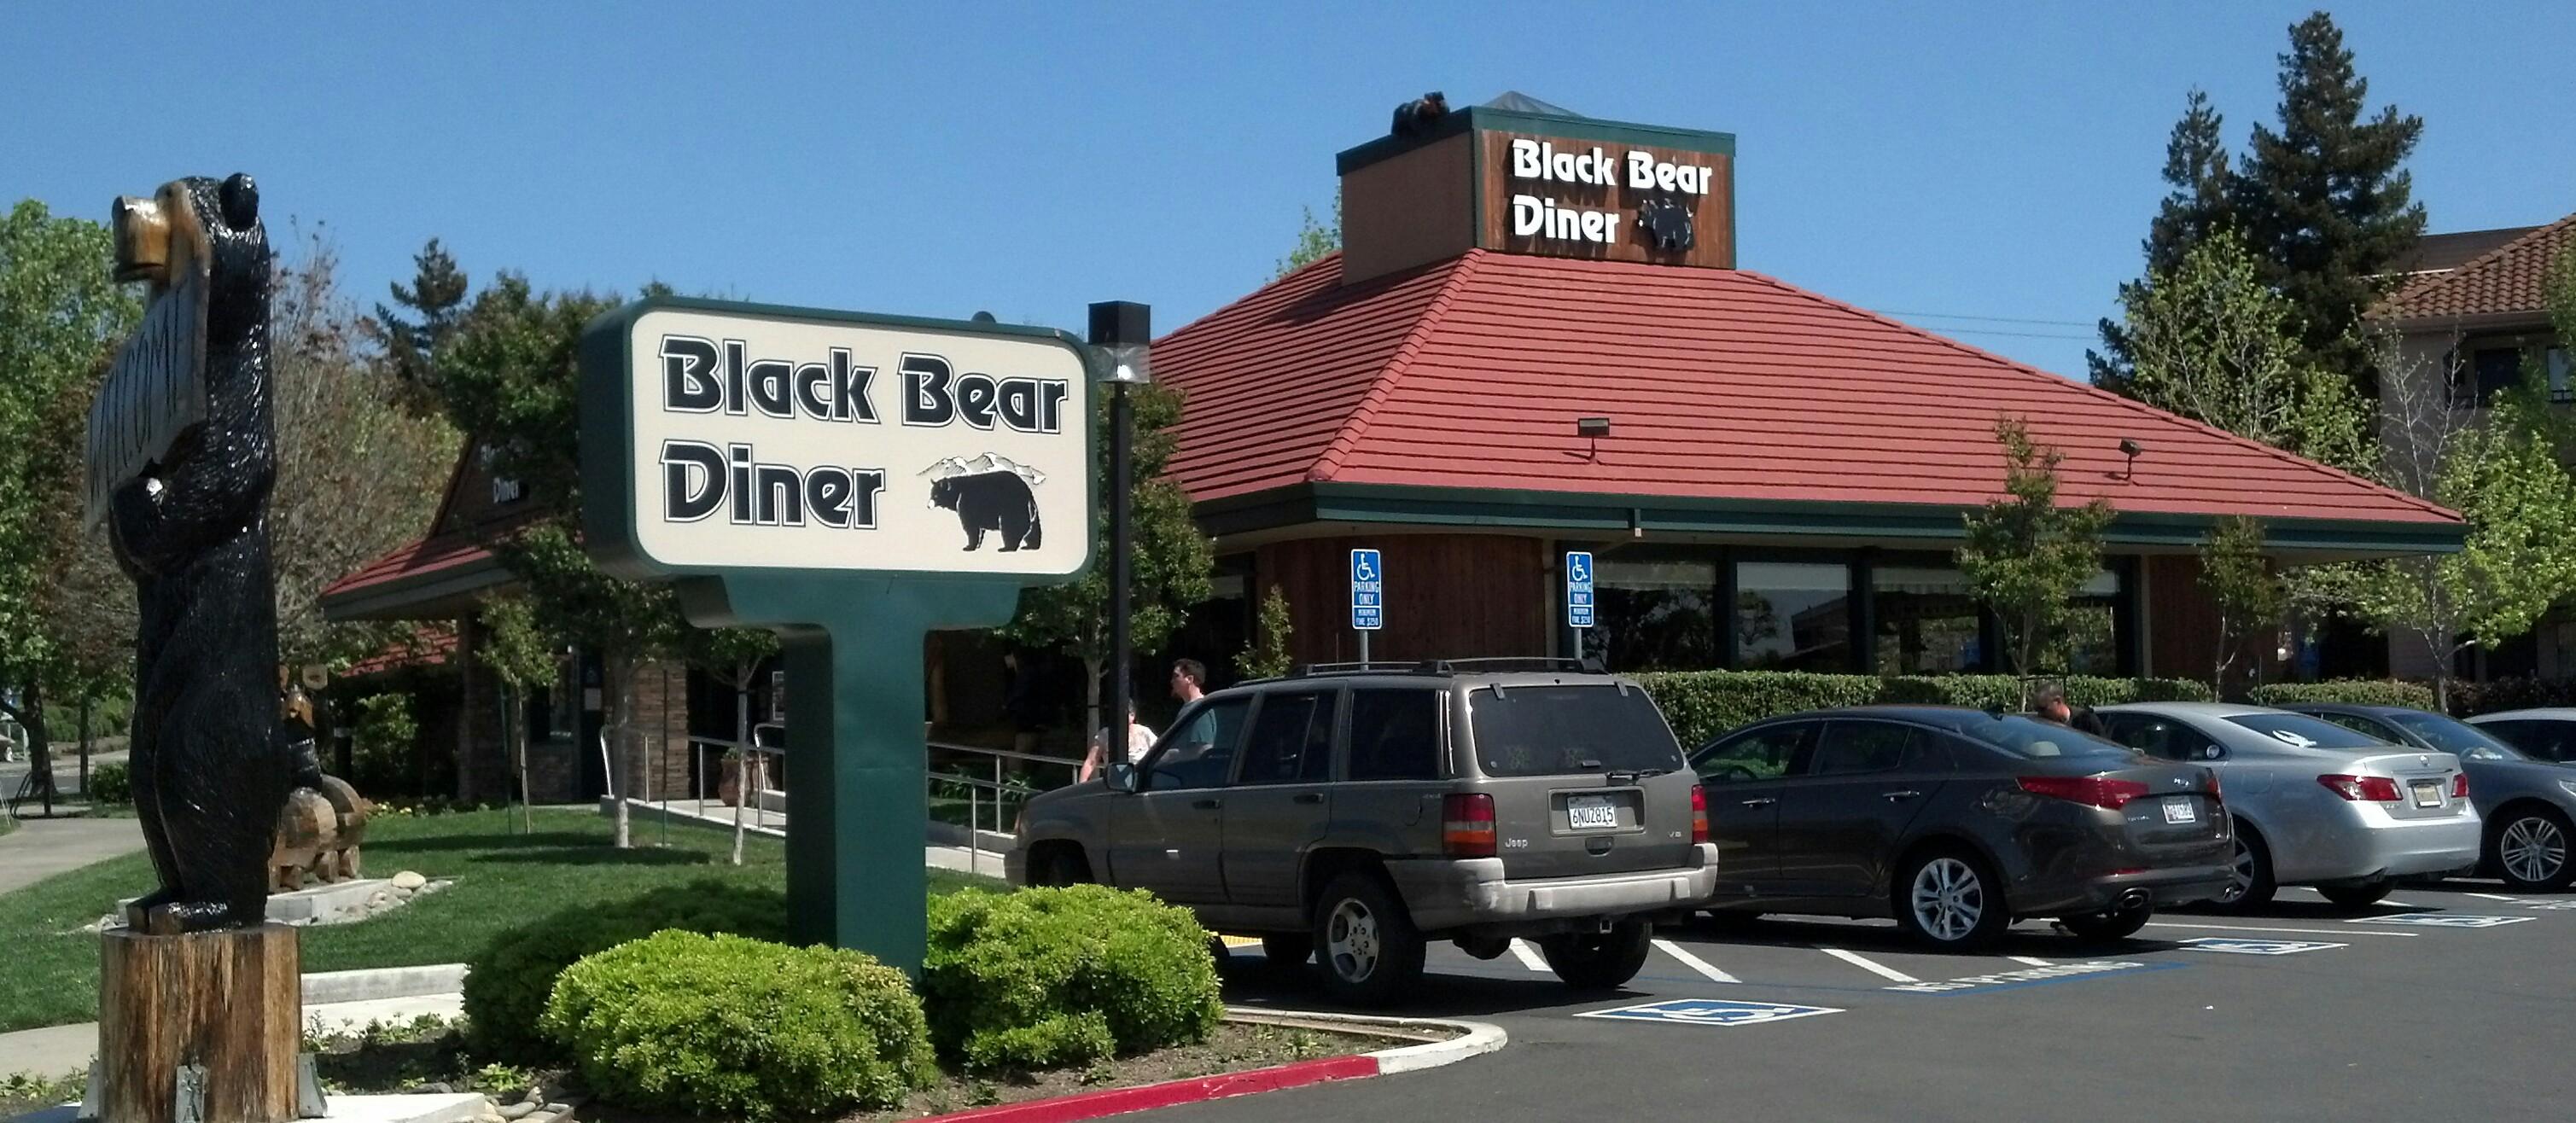 Black Bear Diner Wikipedia